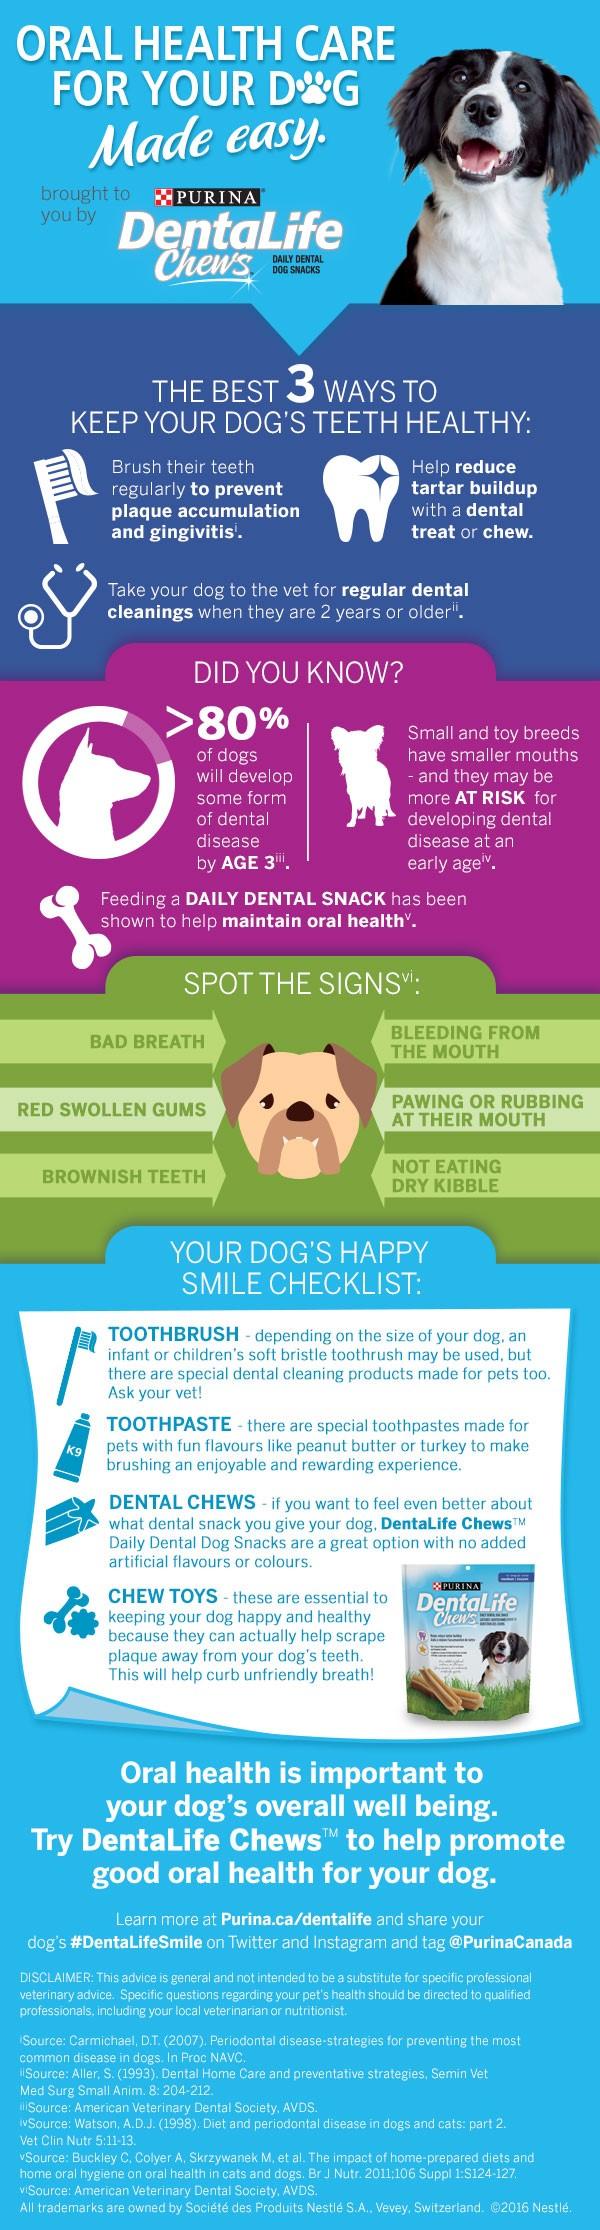 Dentalife Infographic